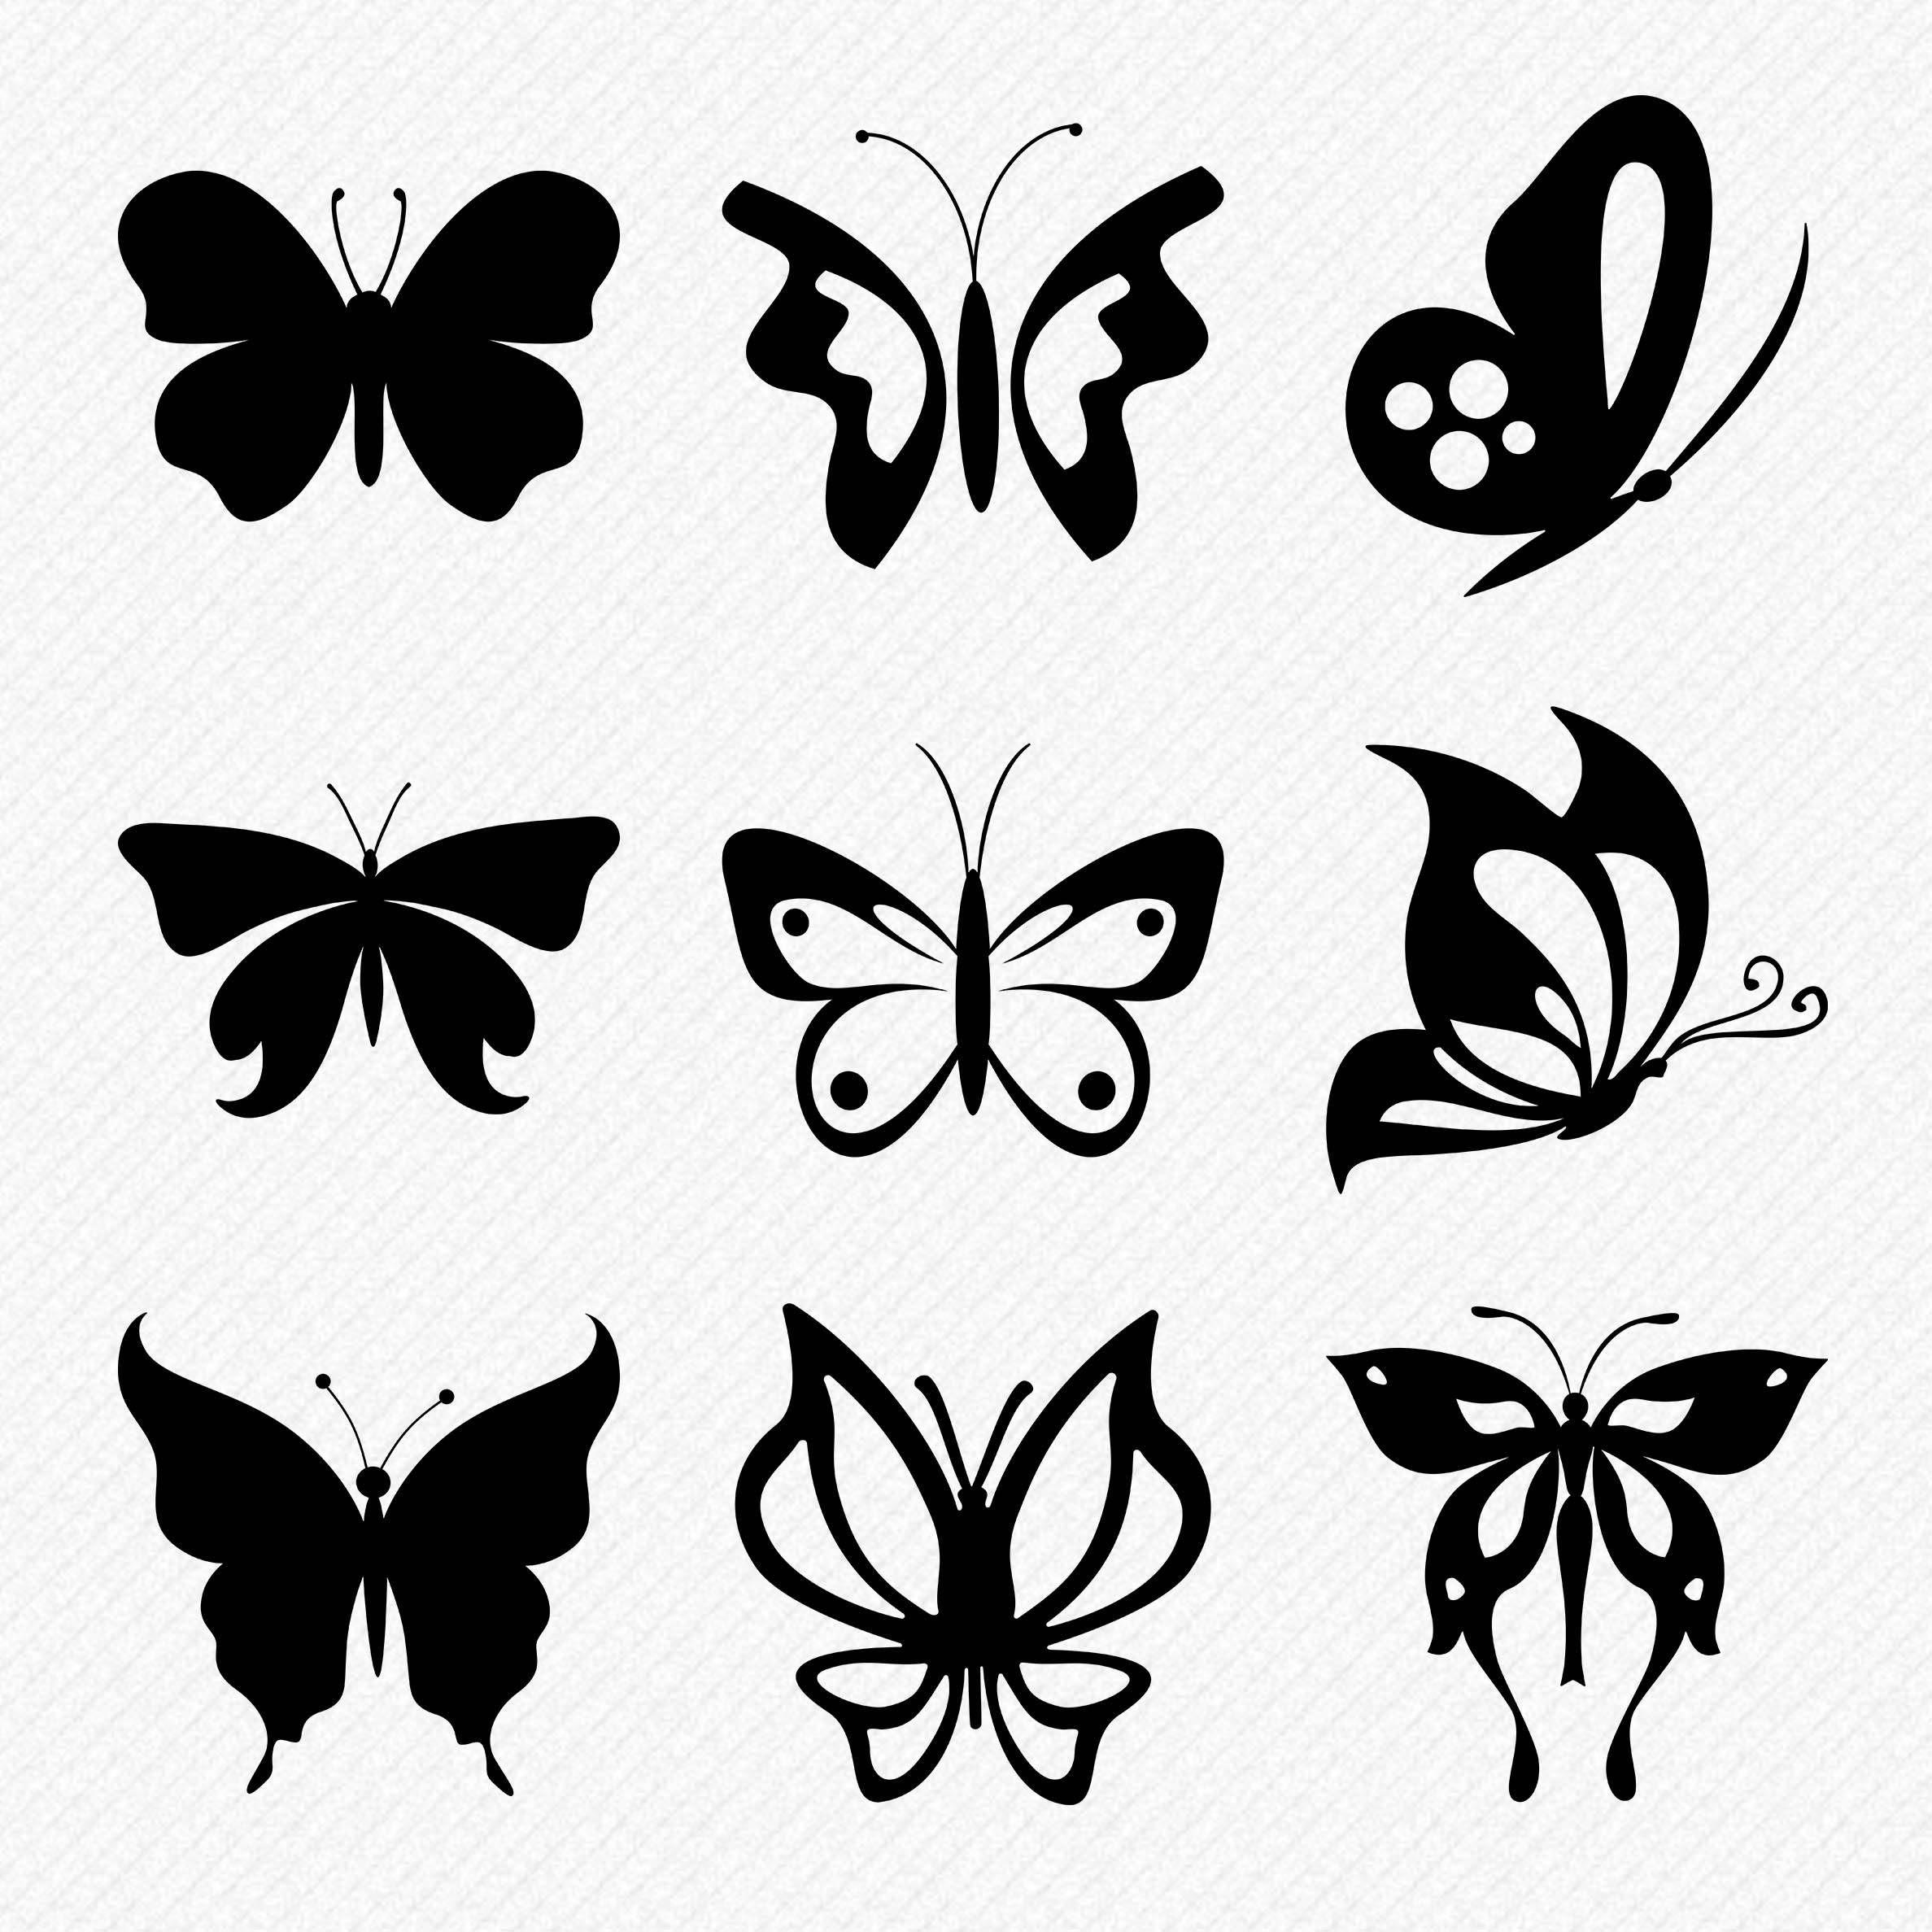 Butterfly SVG set, 9 beautiful butterflies cutting files for wall.